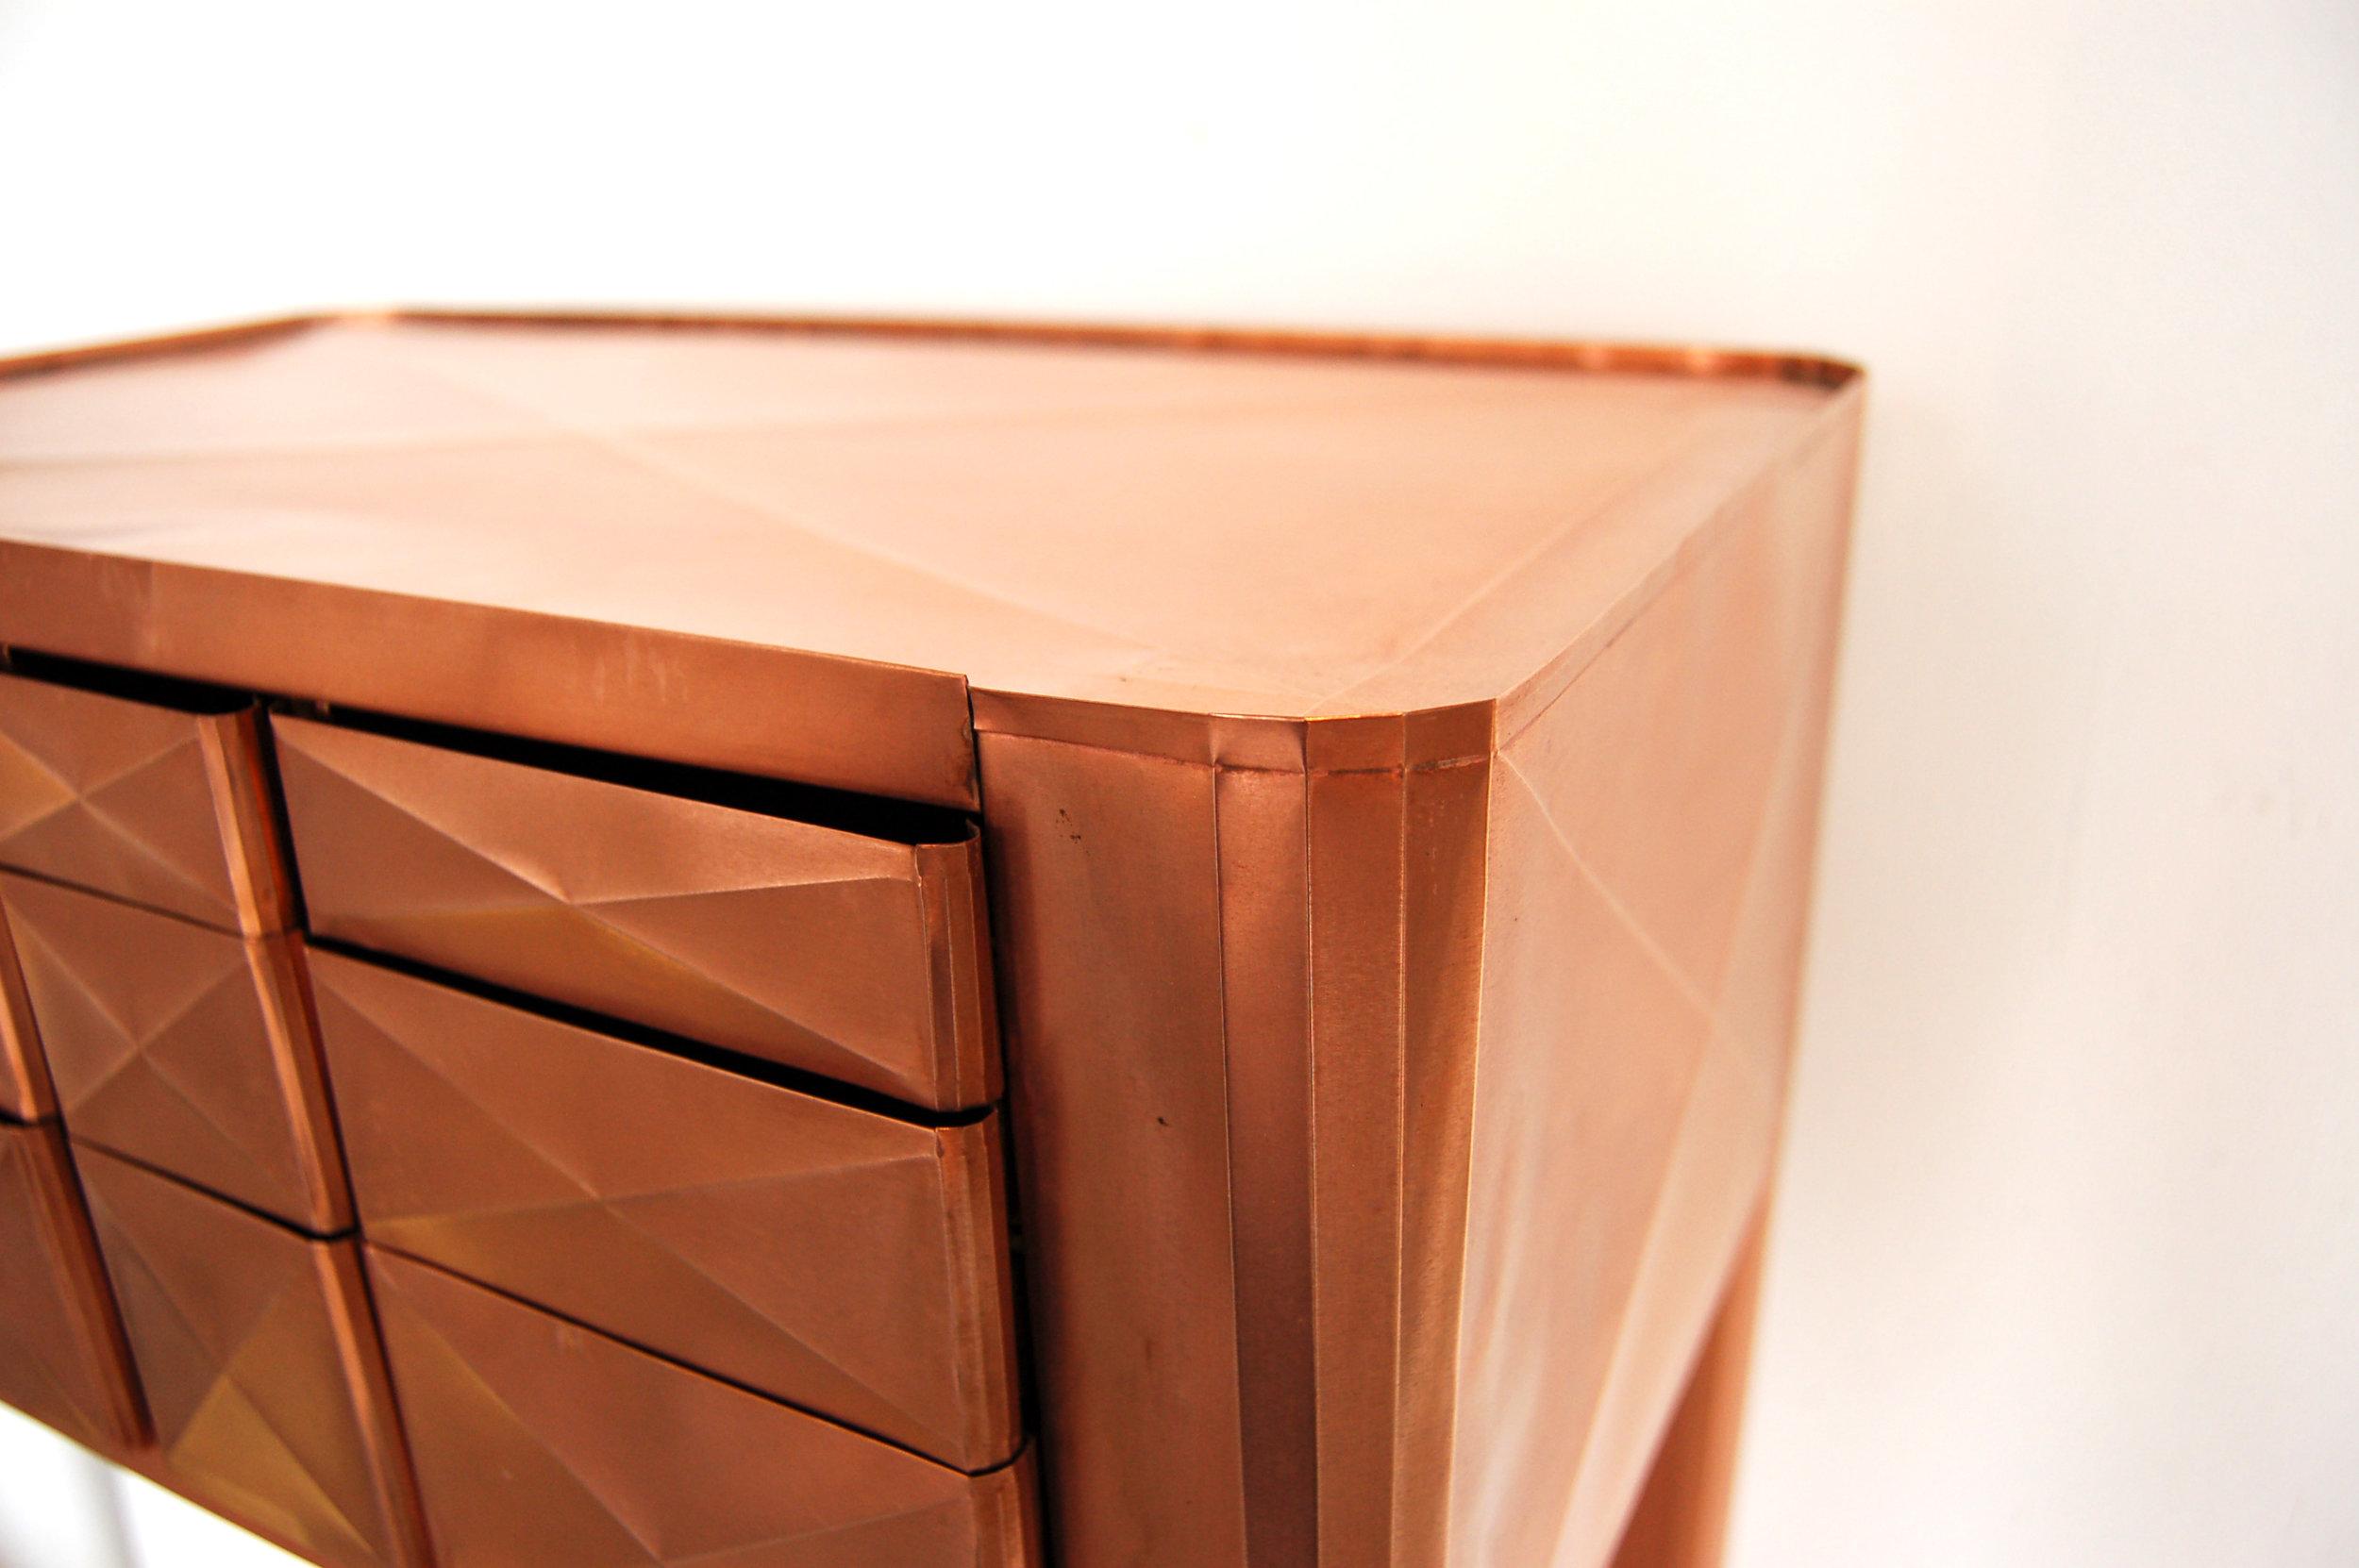 Copper Cabinet Detail 1.JPG